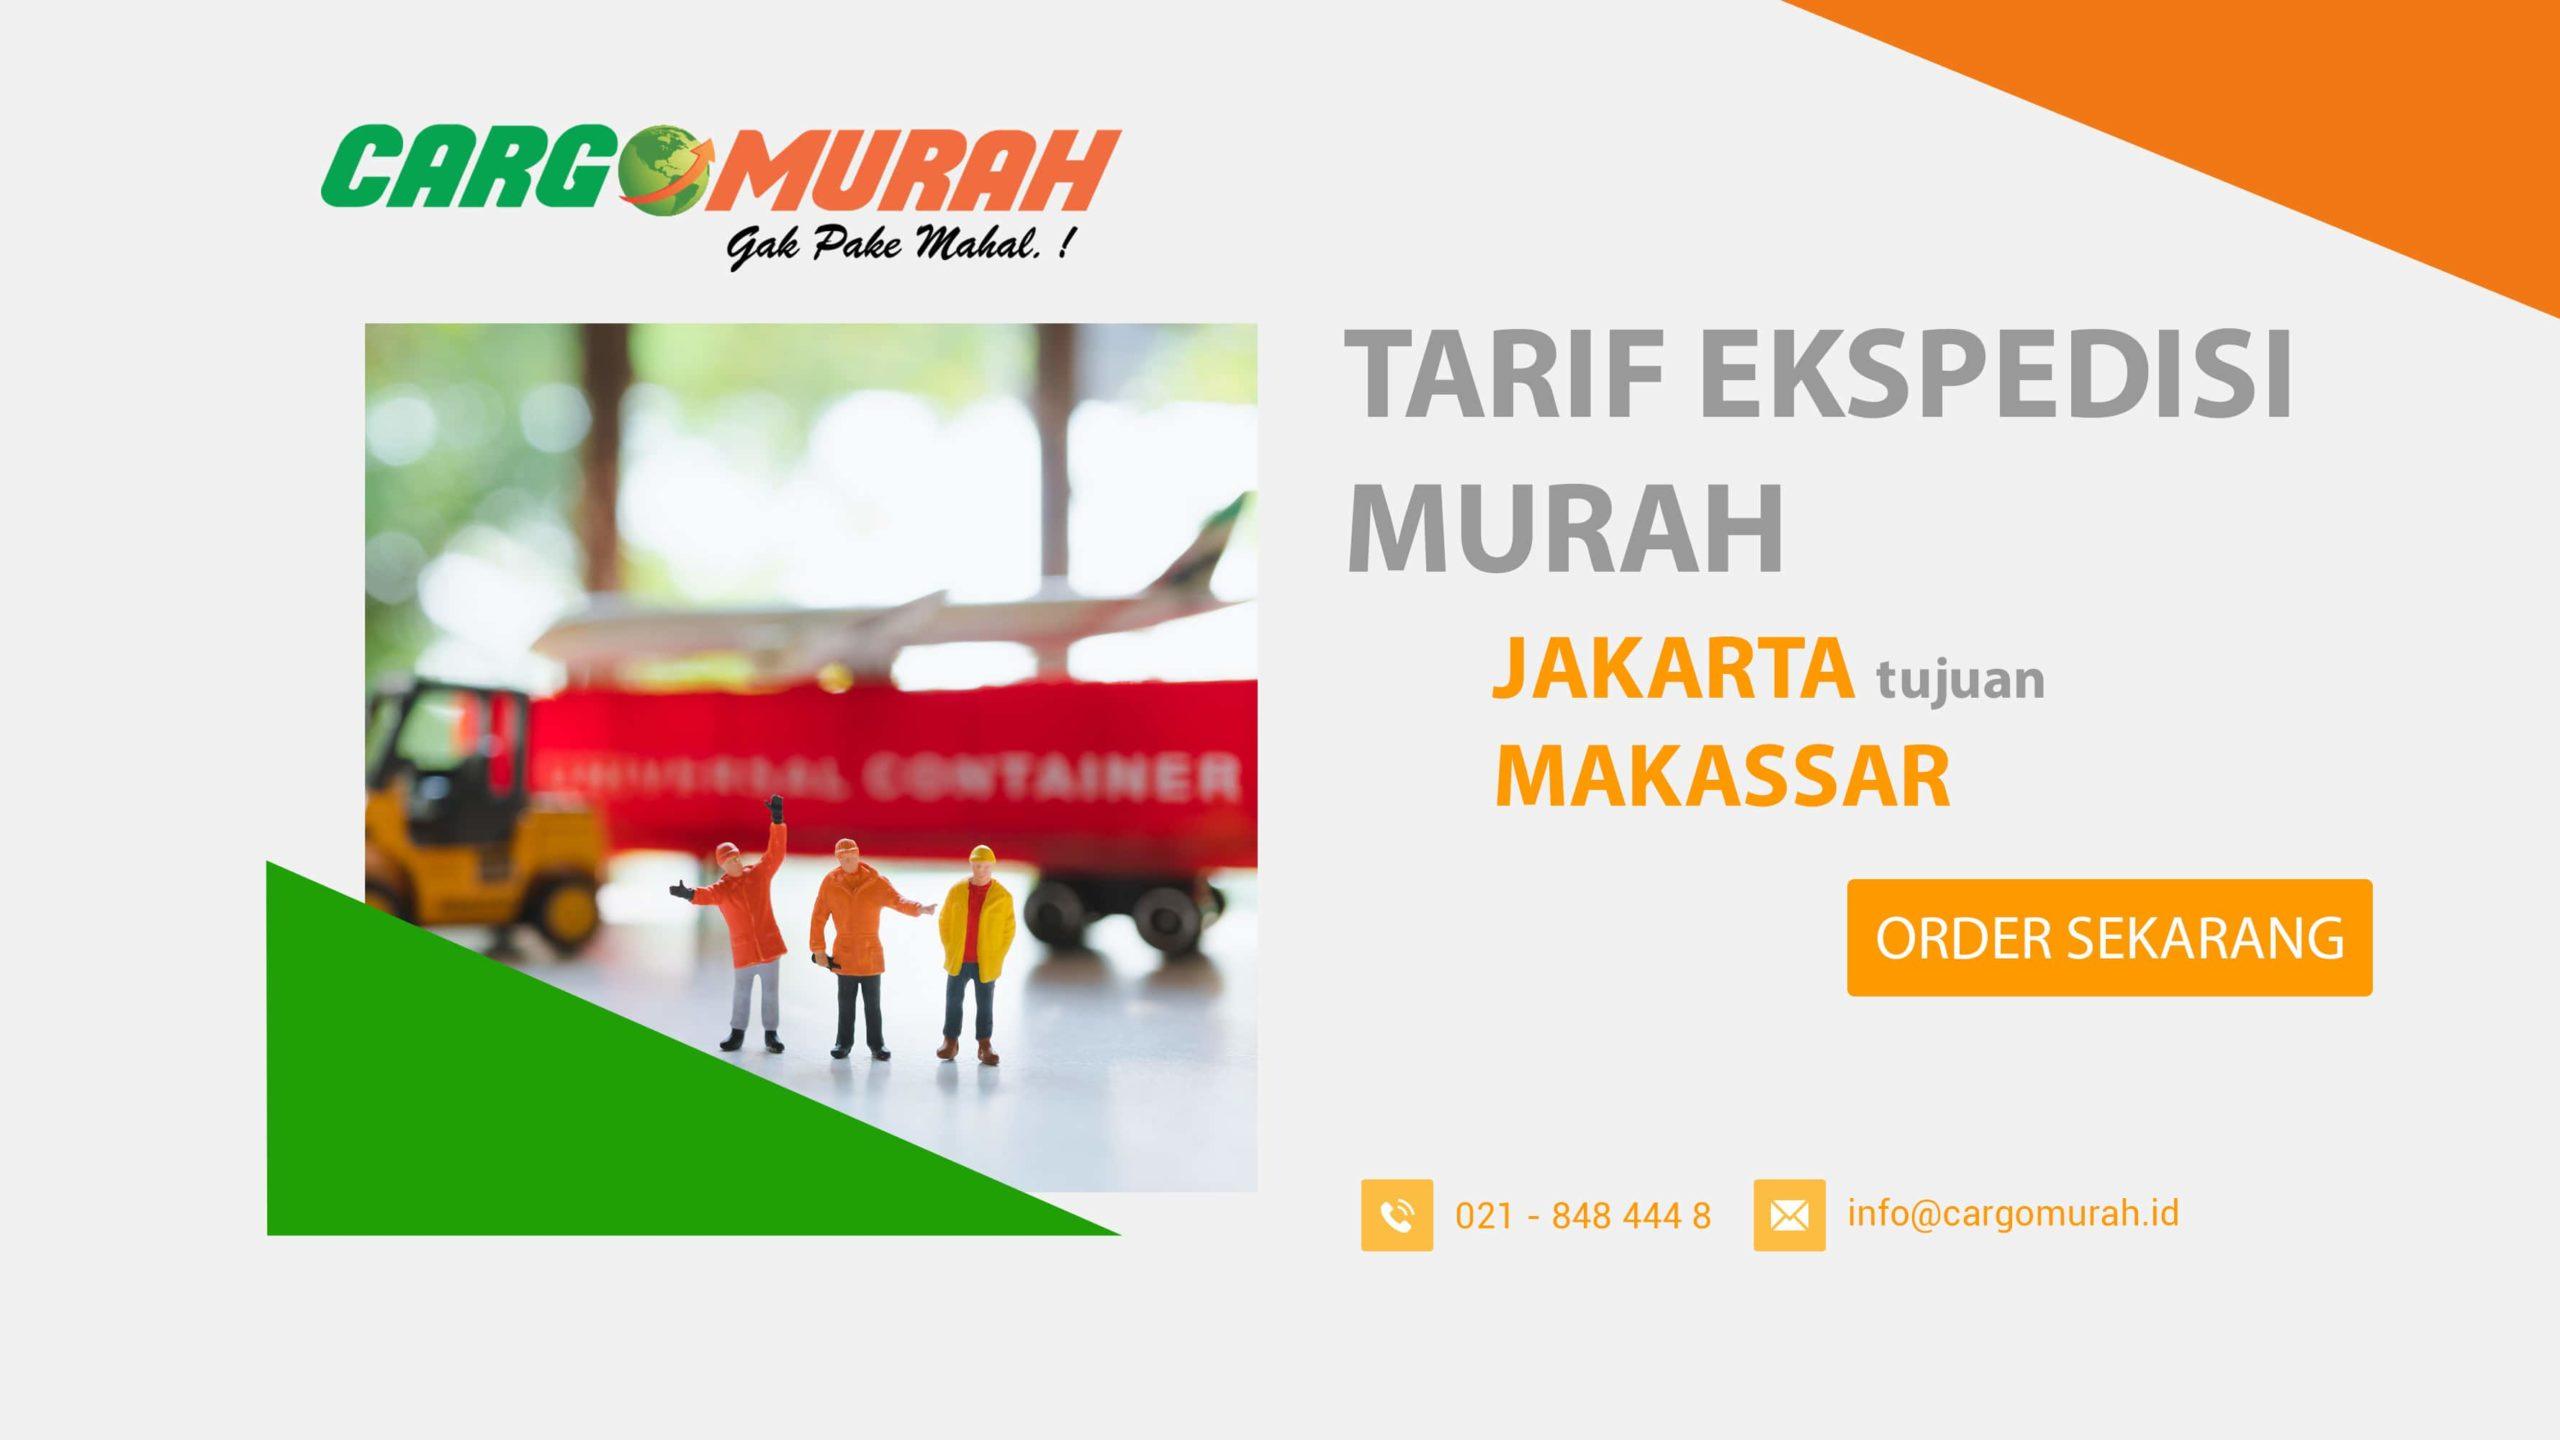 Ekspedisi Jakarta ke Makassar Sulawesi Selatan